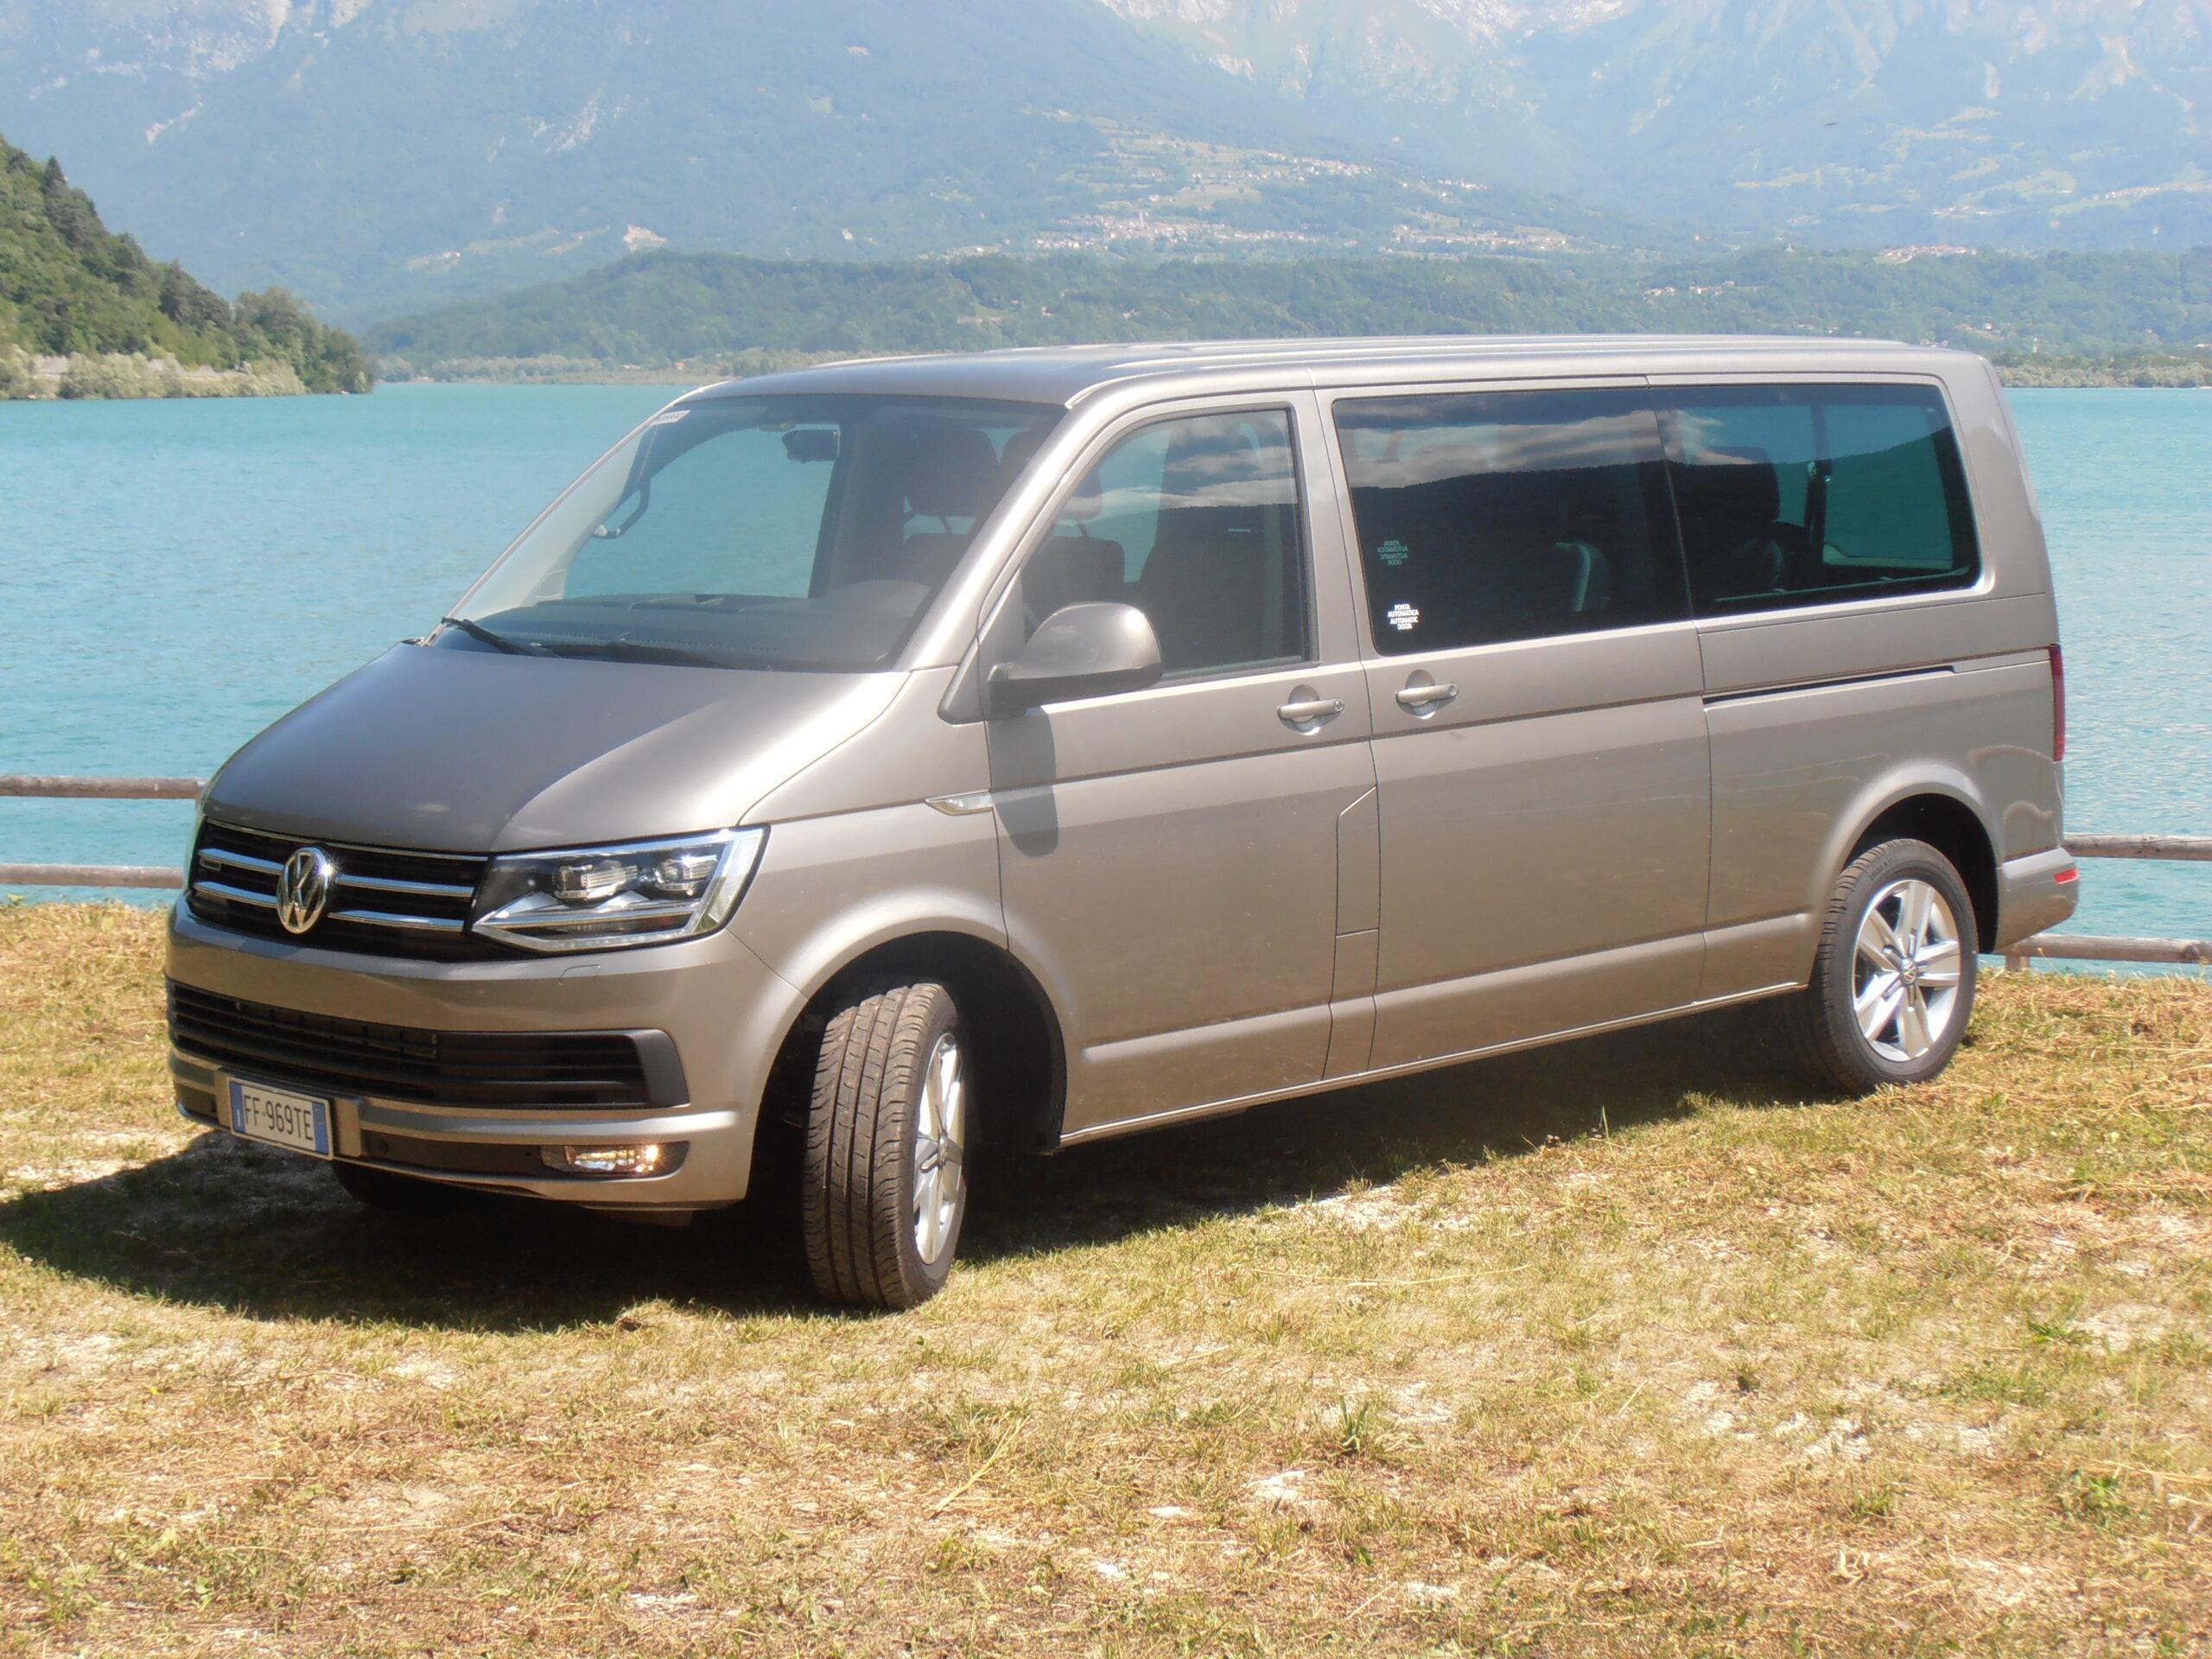 Taxi - Ncc - Transfer - Bike Shuttle - Belluno - Alpago - Longarone - Agordo